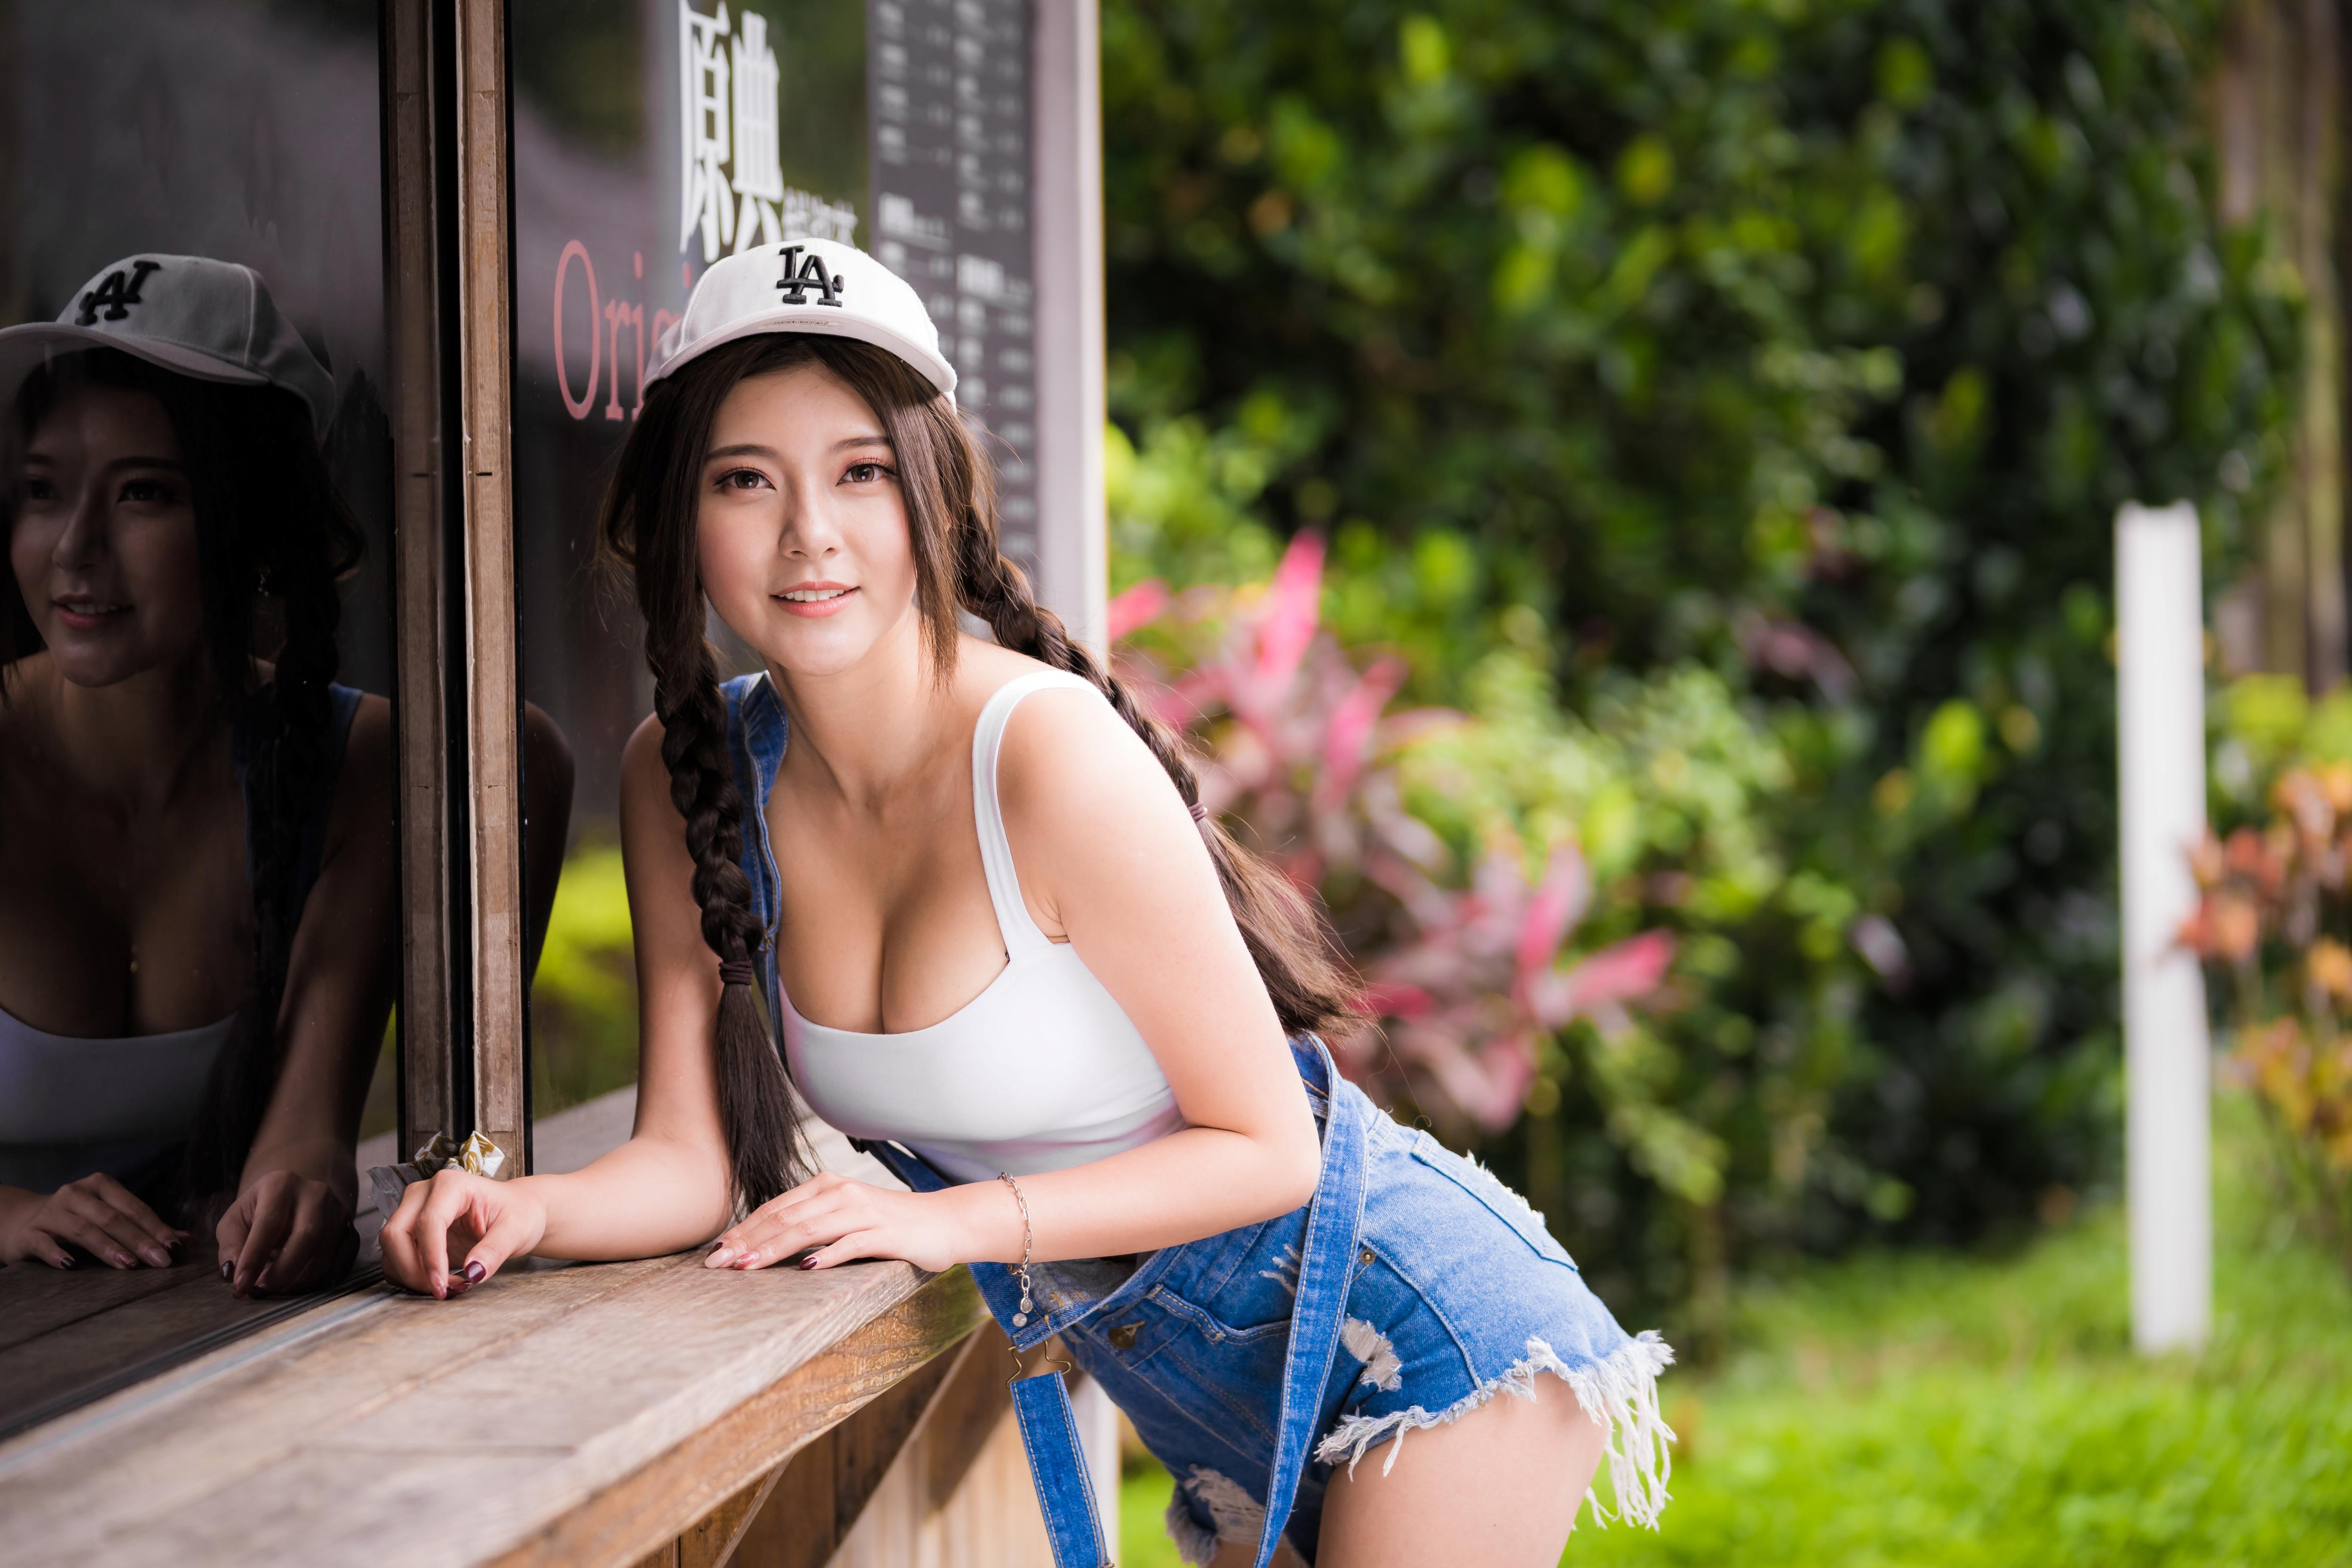 Women Model Asian Brunette Baseball Caps Braids Braided Hair White Tops Overalls Torn Clothes Denim  5000x3333